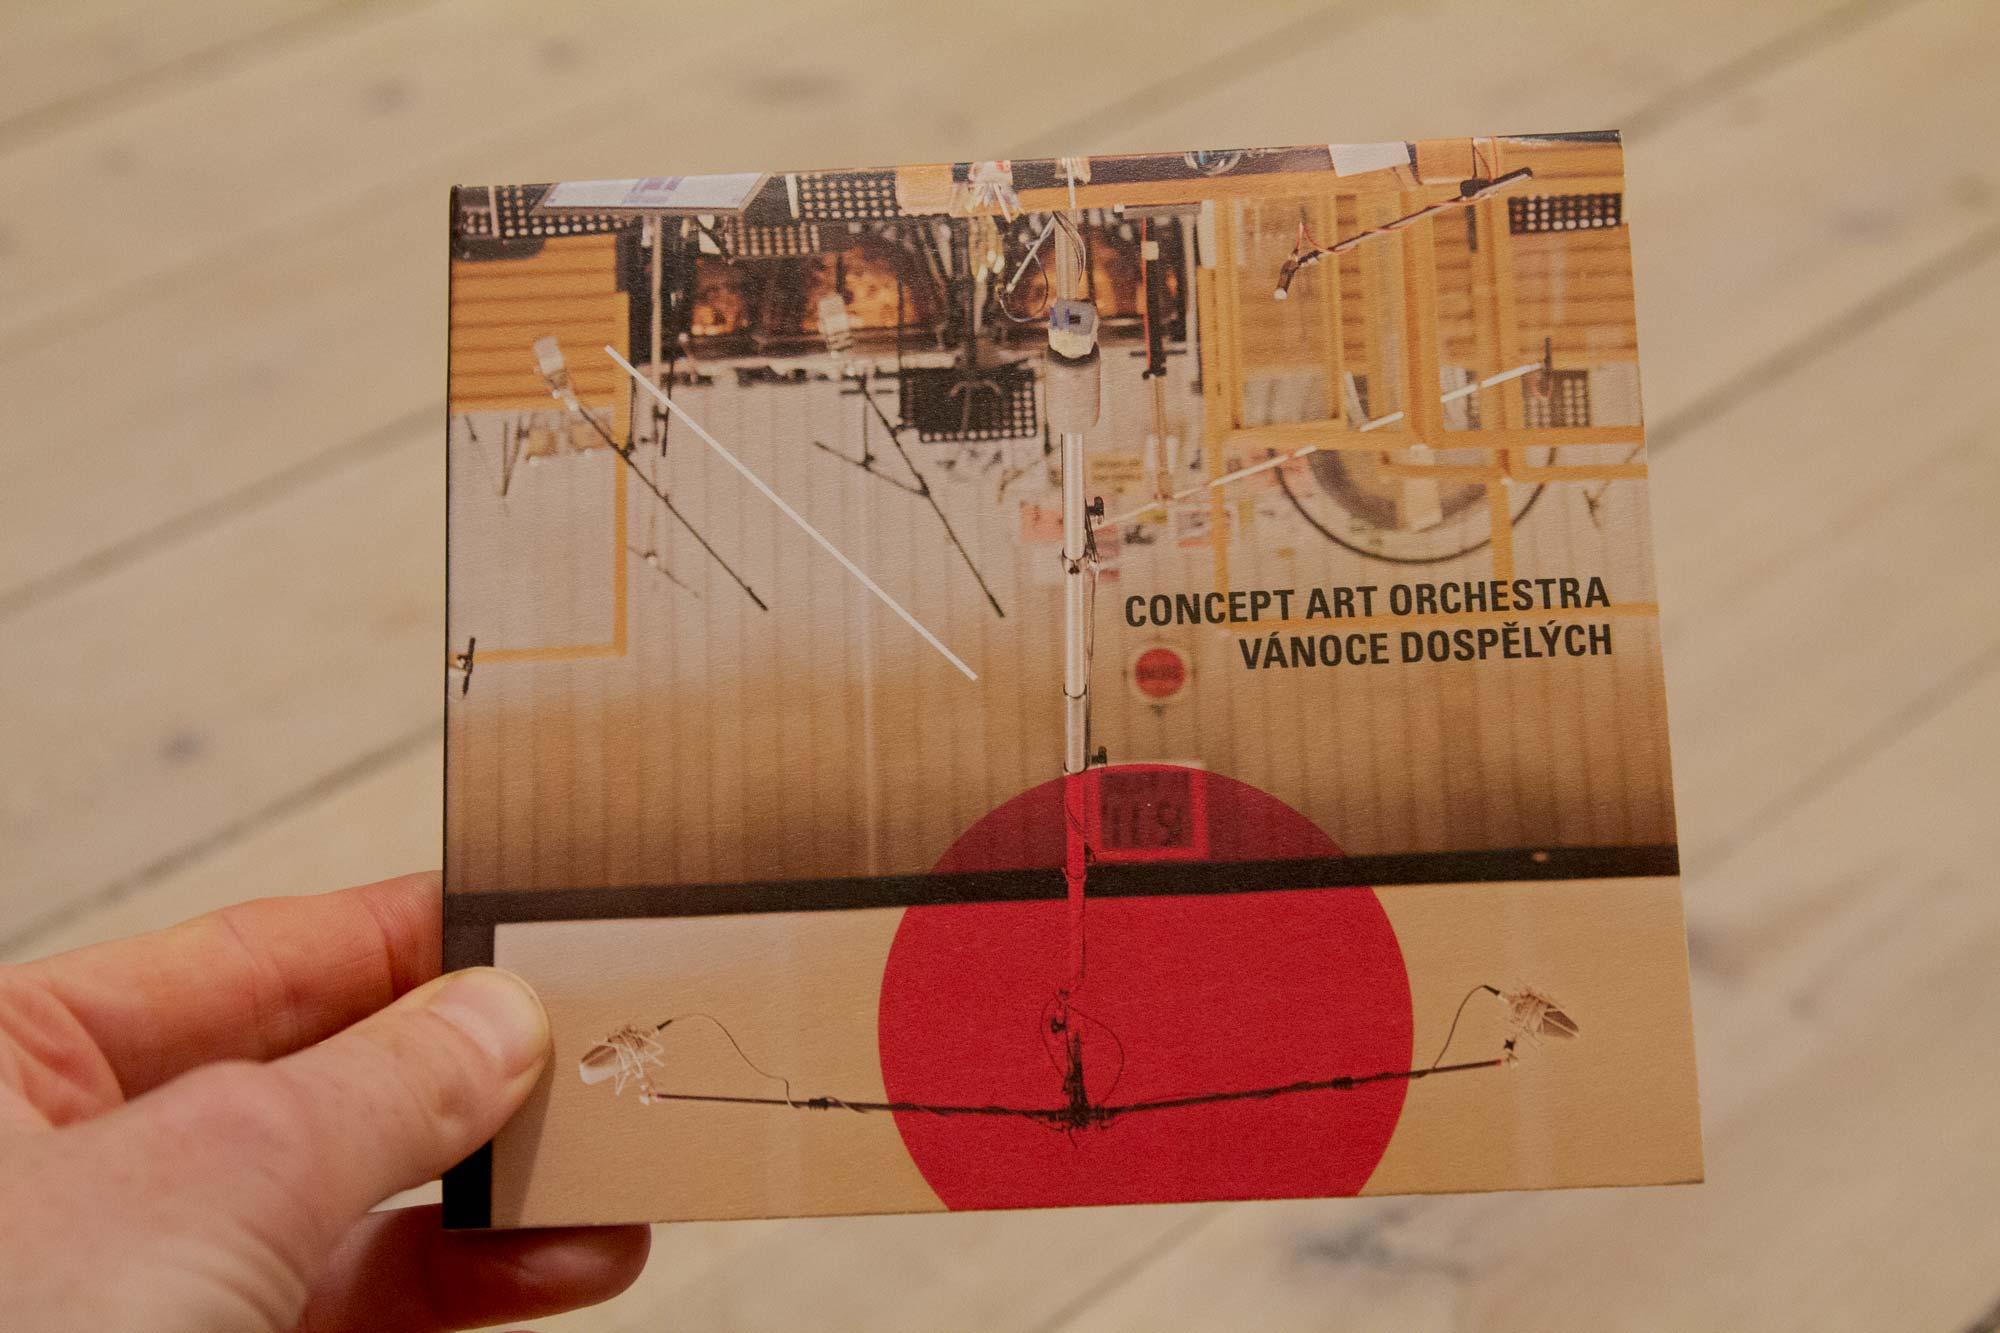 Alabum Vanoce dospelych Concept Art Orchestra